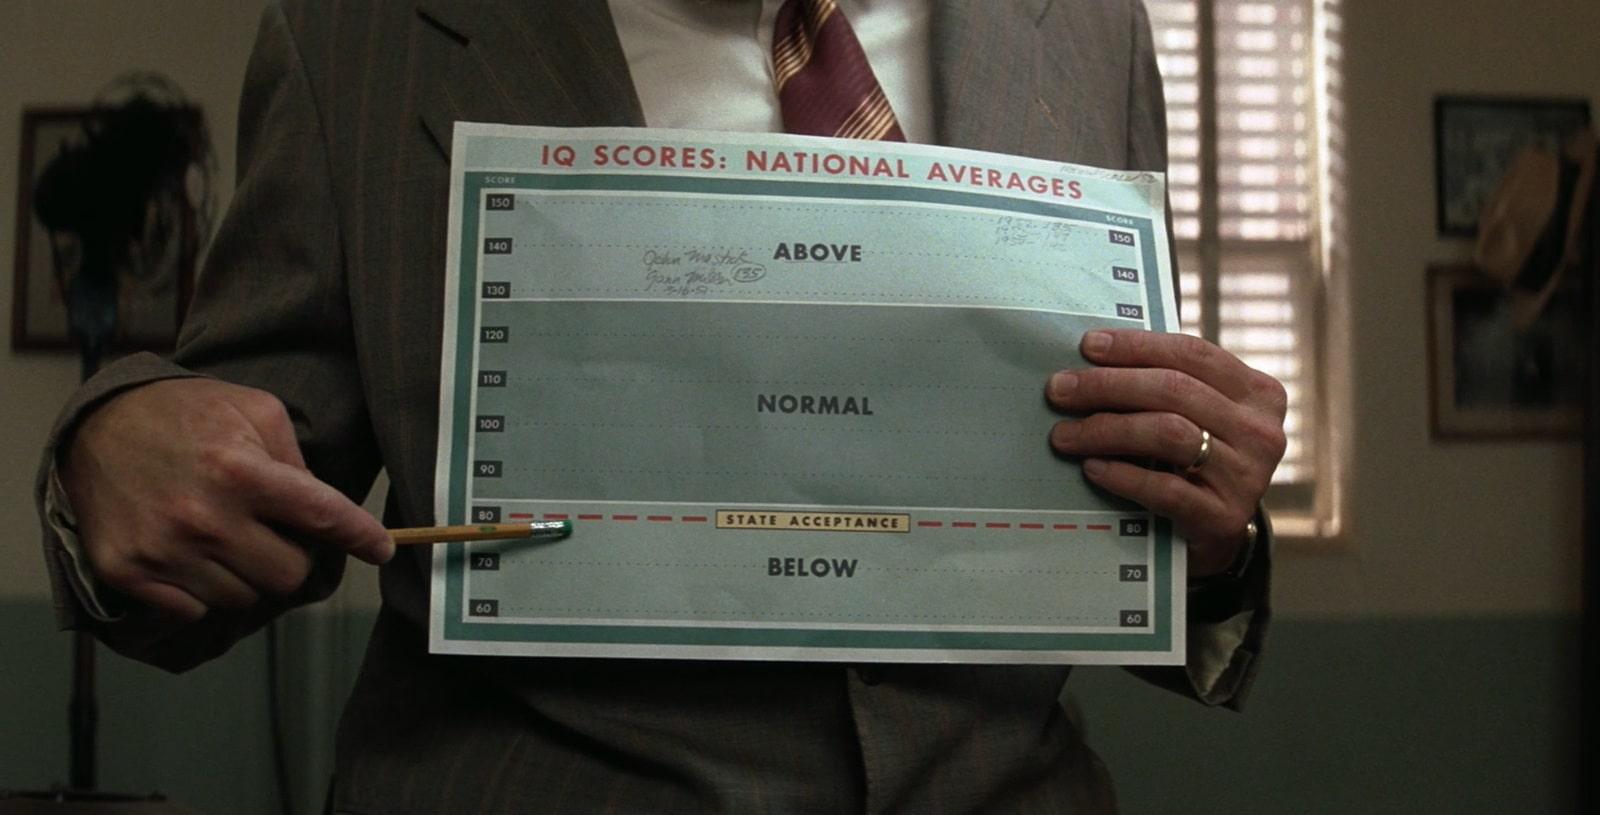 IQ scores of Forrest Gump